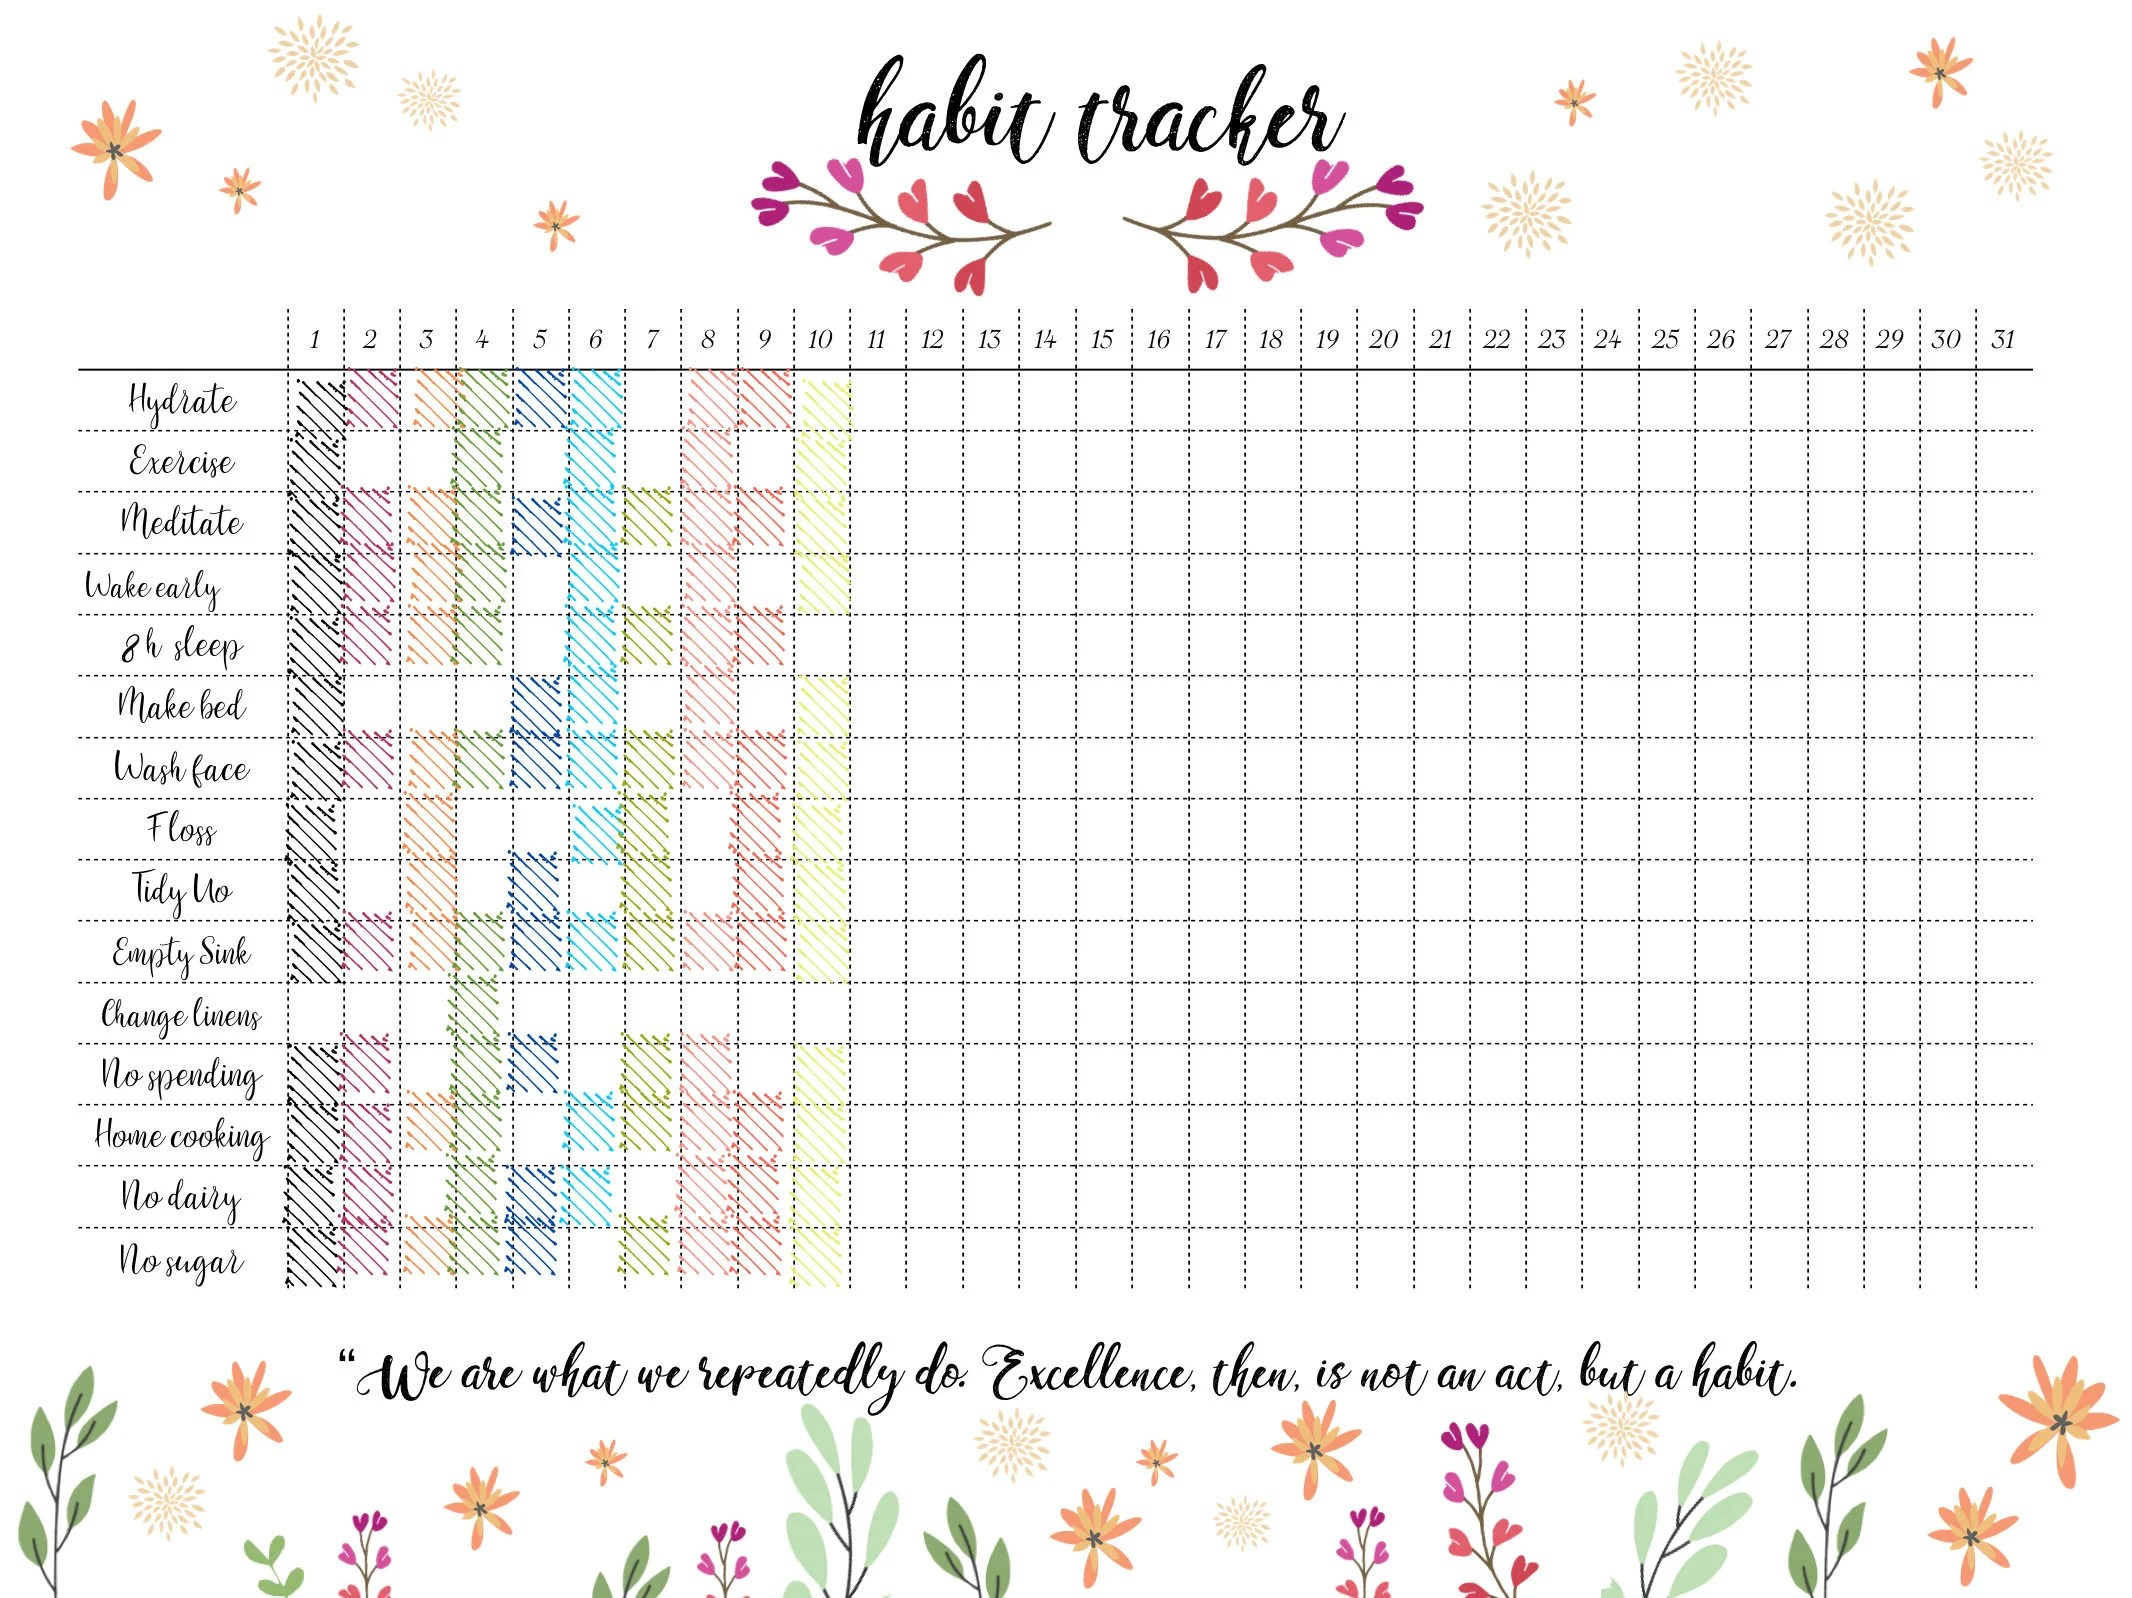 Habit Tracker Bullet Journal Track Your Habits Orange